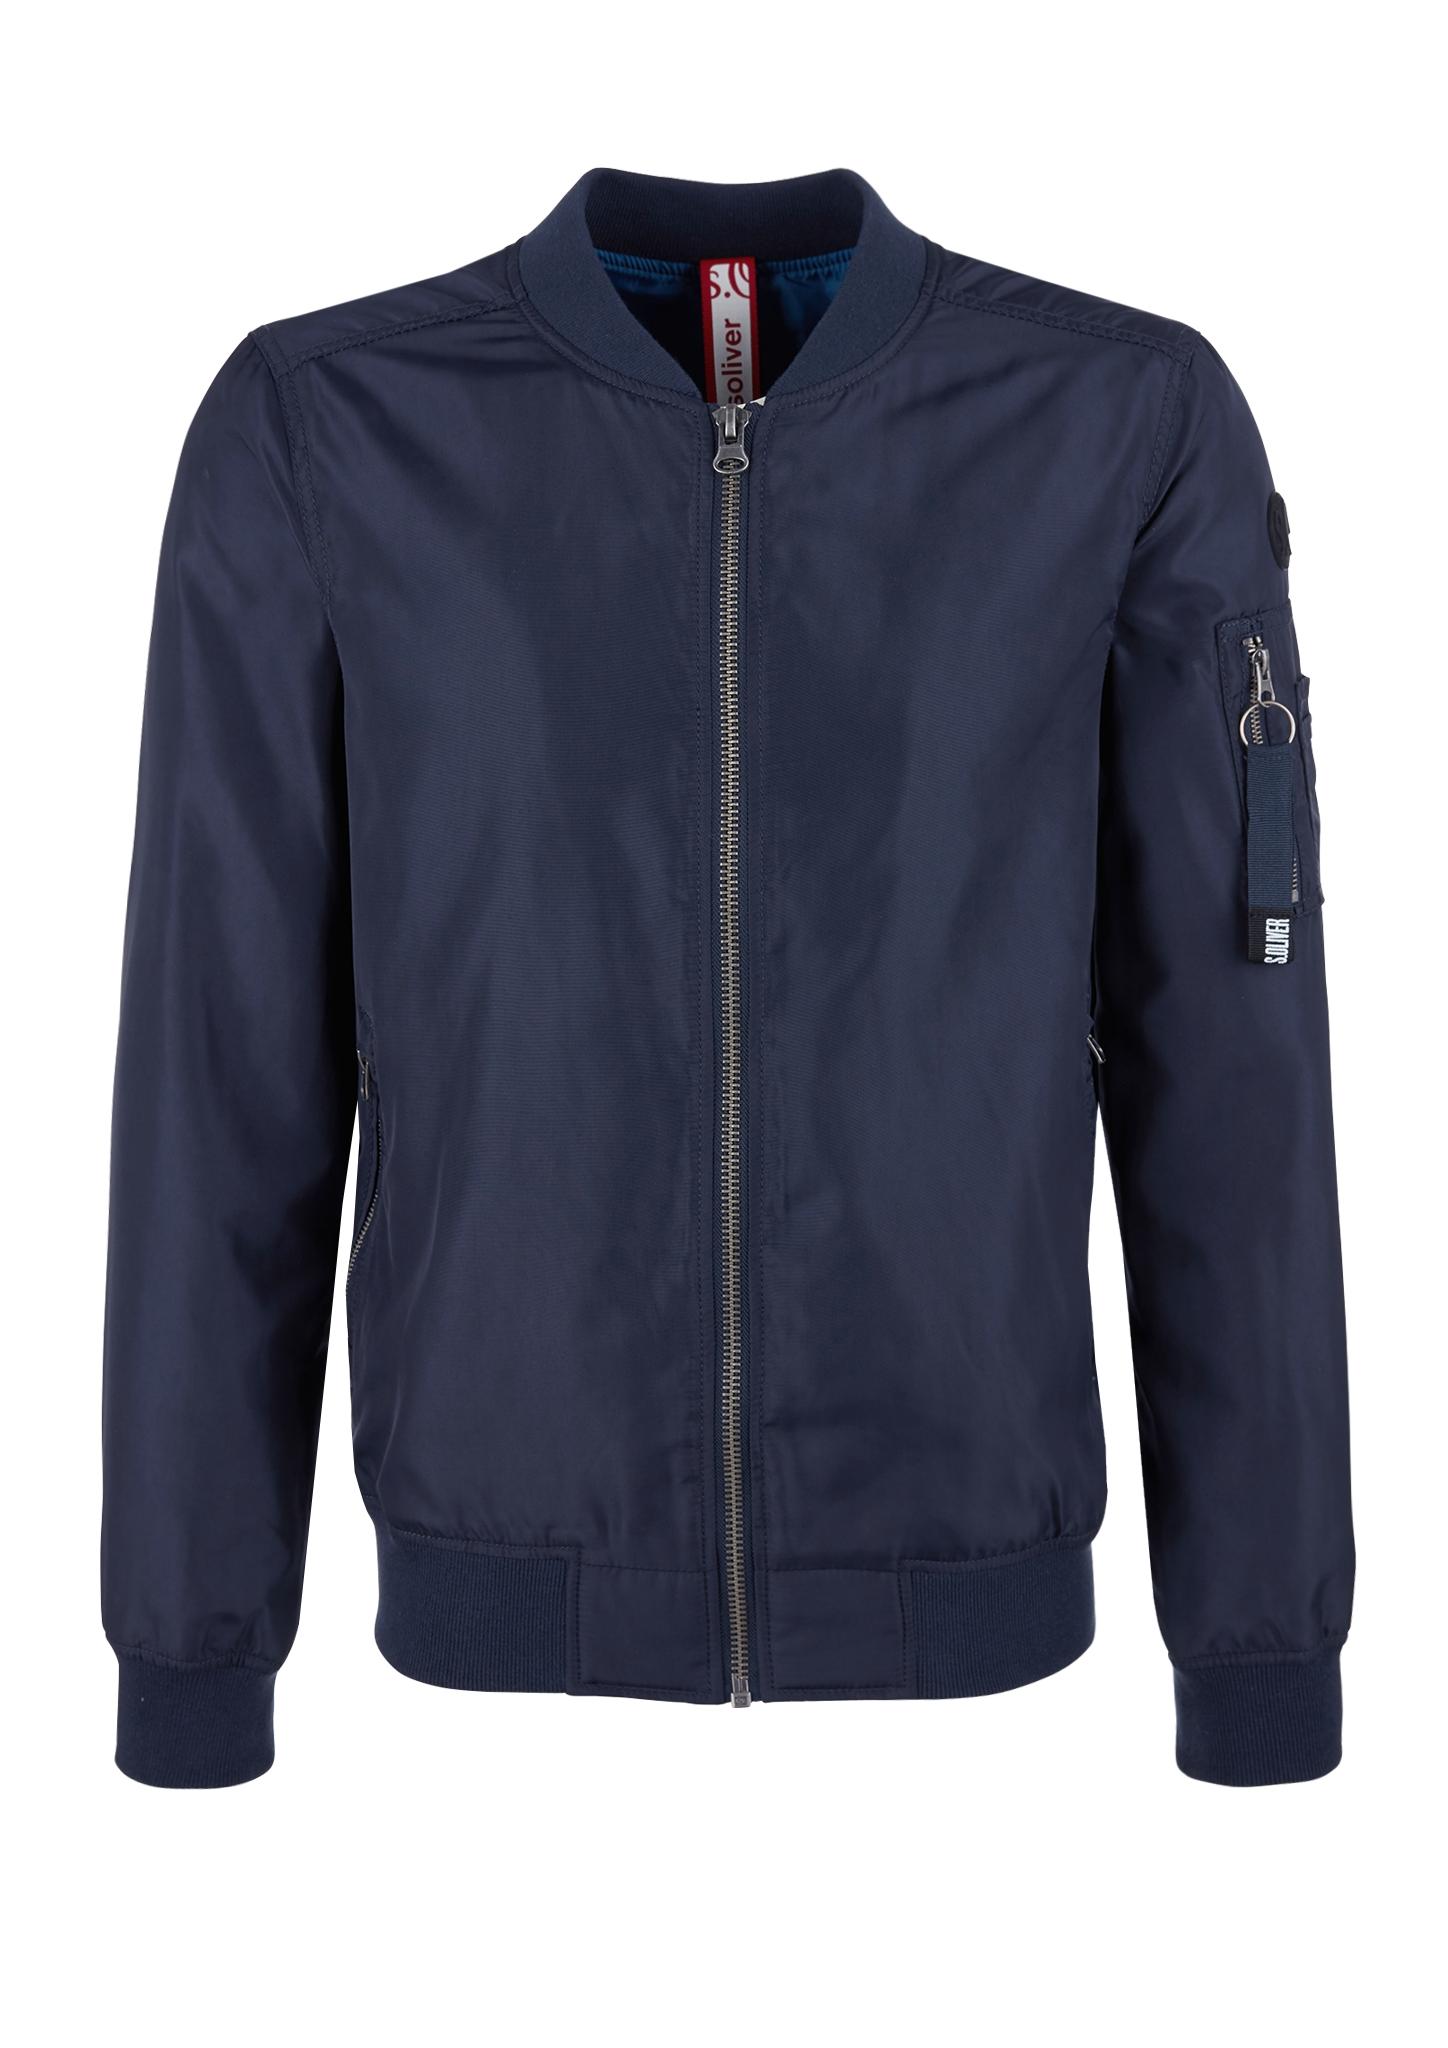 Bomberjacke | Bekleidung > Jacken > Bomberjacken | Blau | Obermaterial 100% polyamid| kragen 65% baumwolle -  35% polyester| futter 100% polyester | s.Oliver